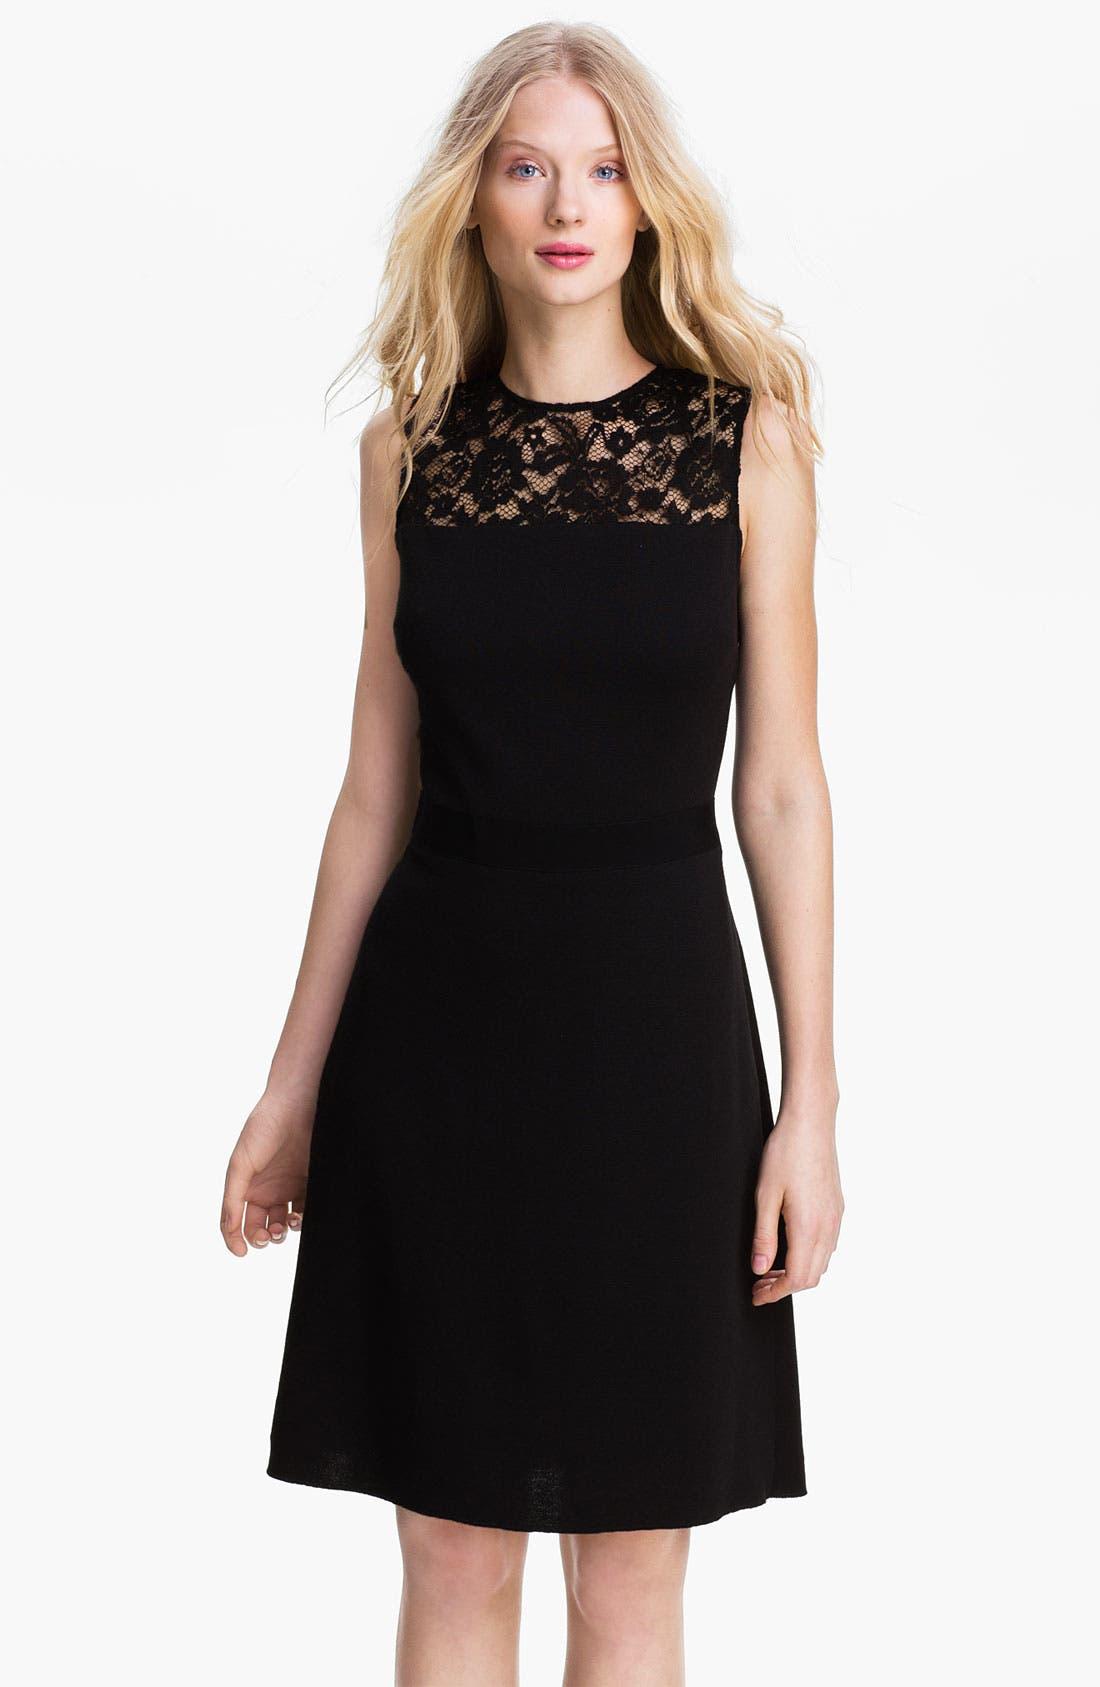 Main Image - Tory Burch 'Adrianna' Wool Blend A-Line Dress